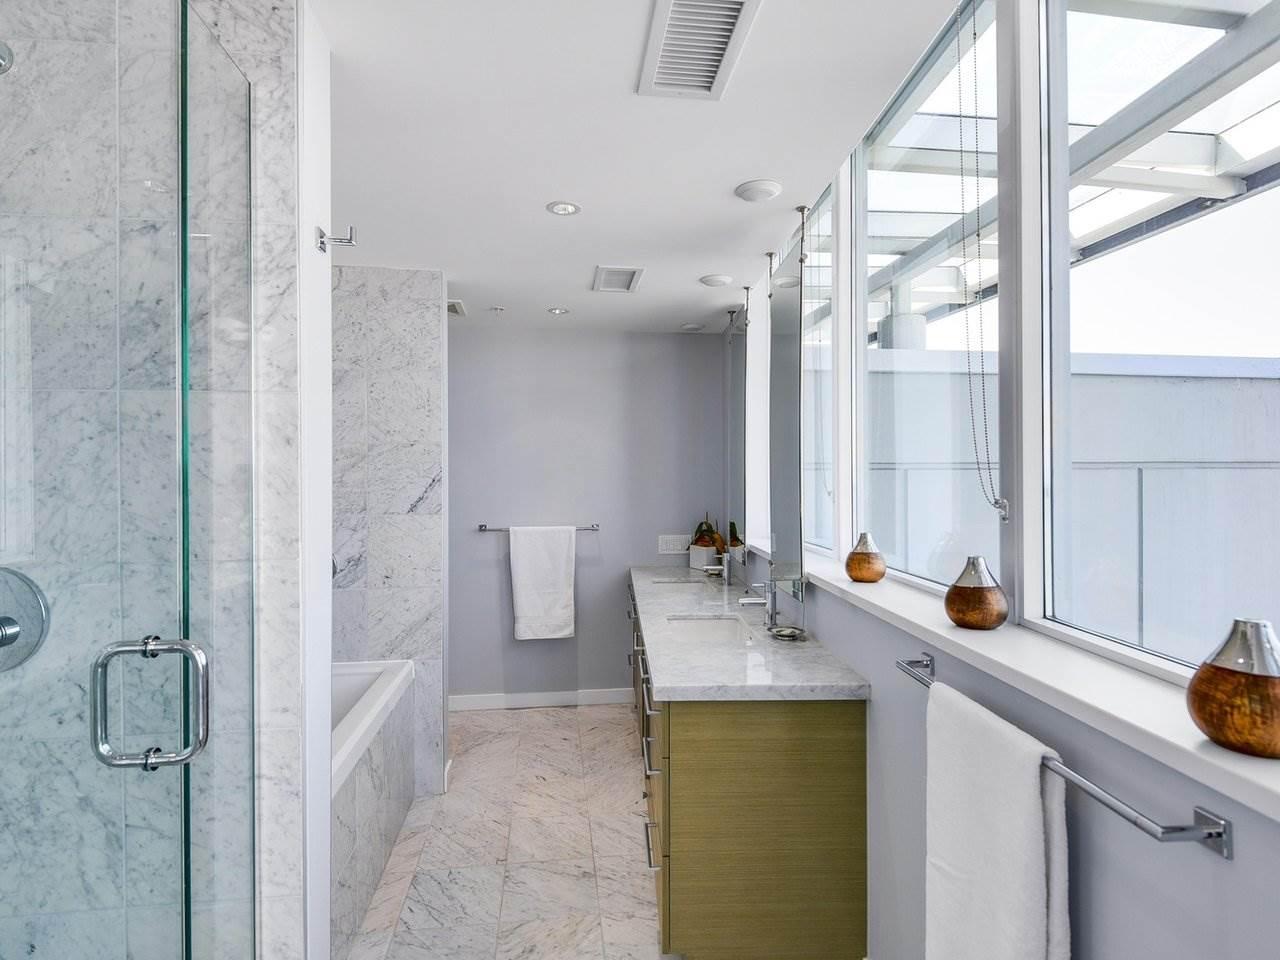 Condo Apartment at PH3 833 SEYMOUR STREET, Unit PH3, Vancouver West, British Columbia. Image 16